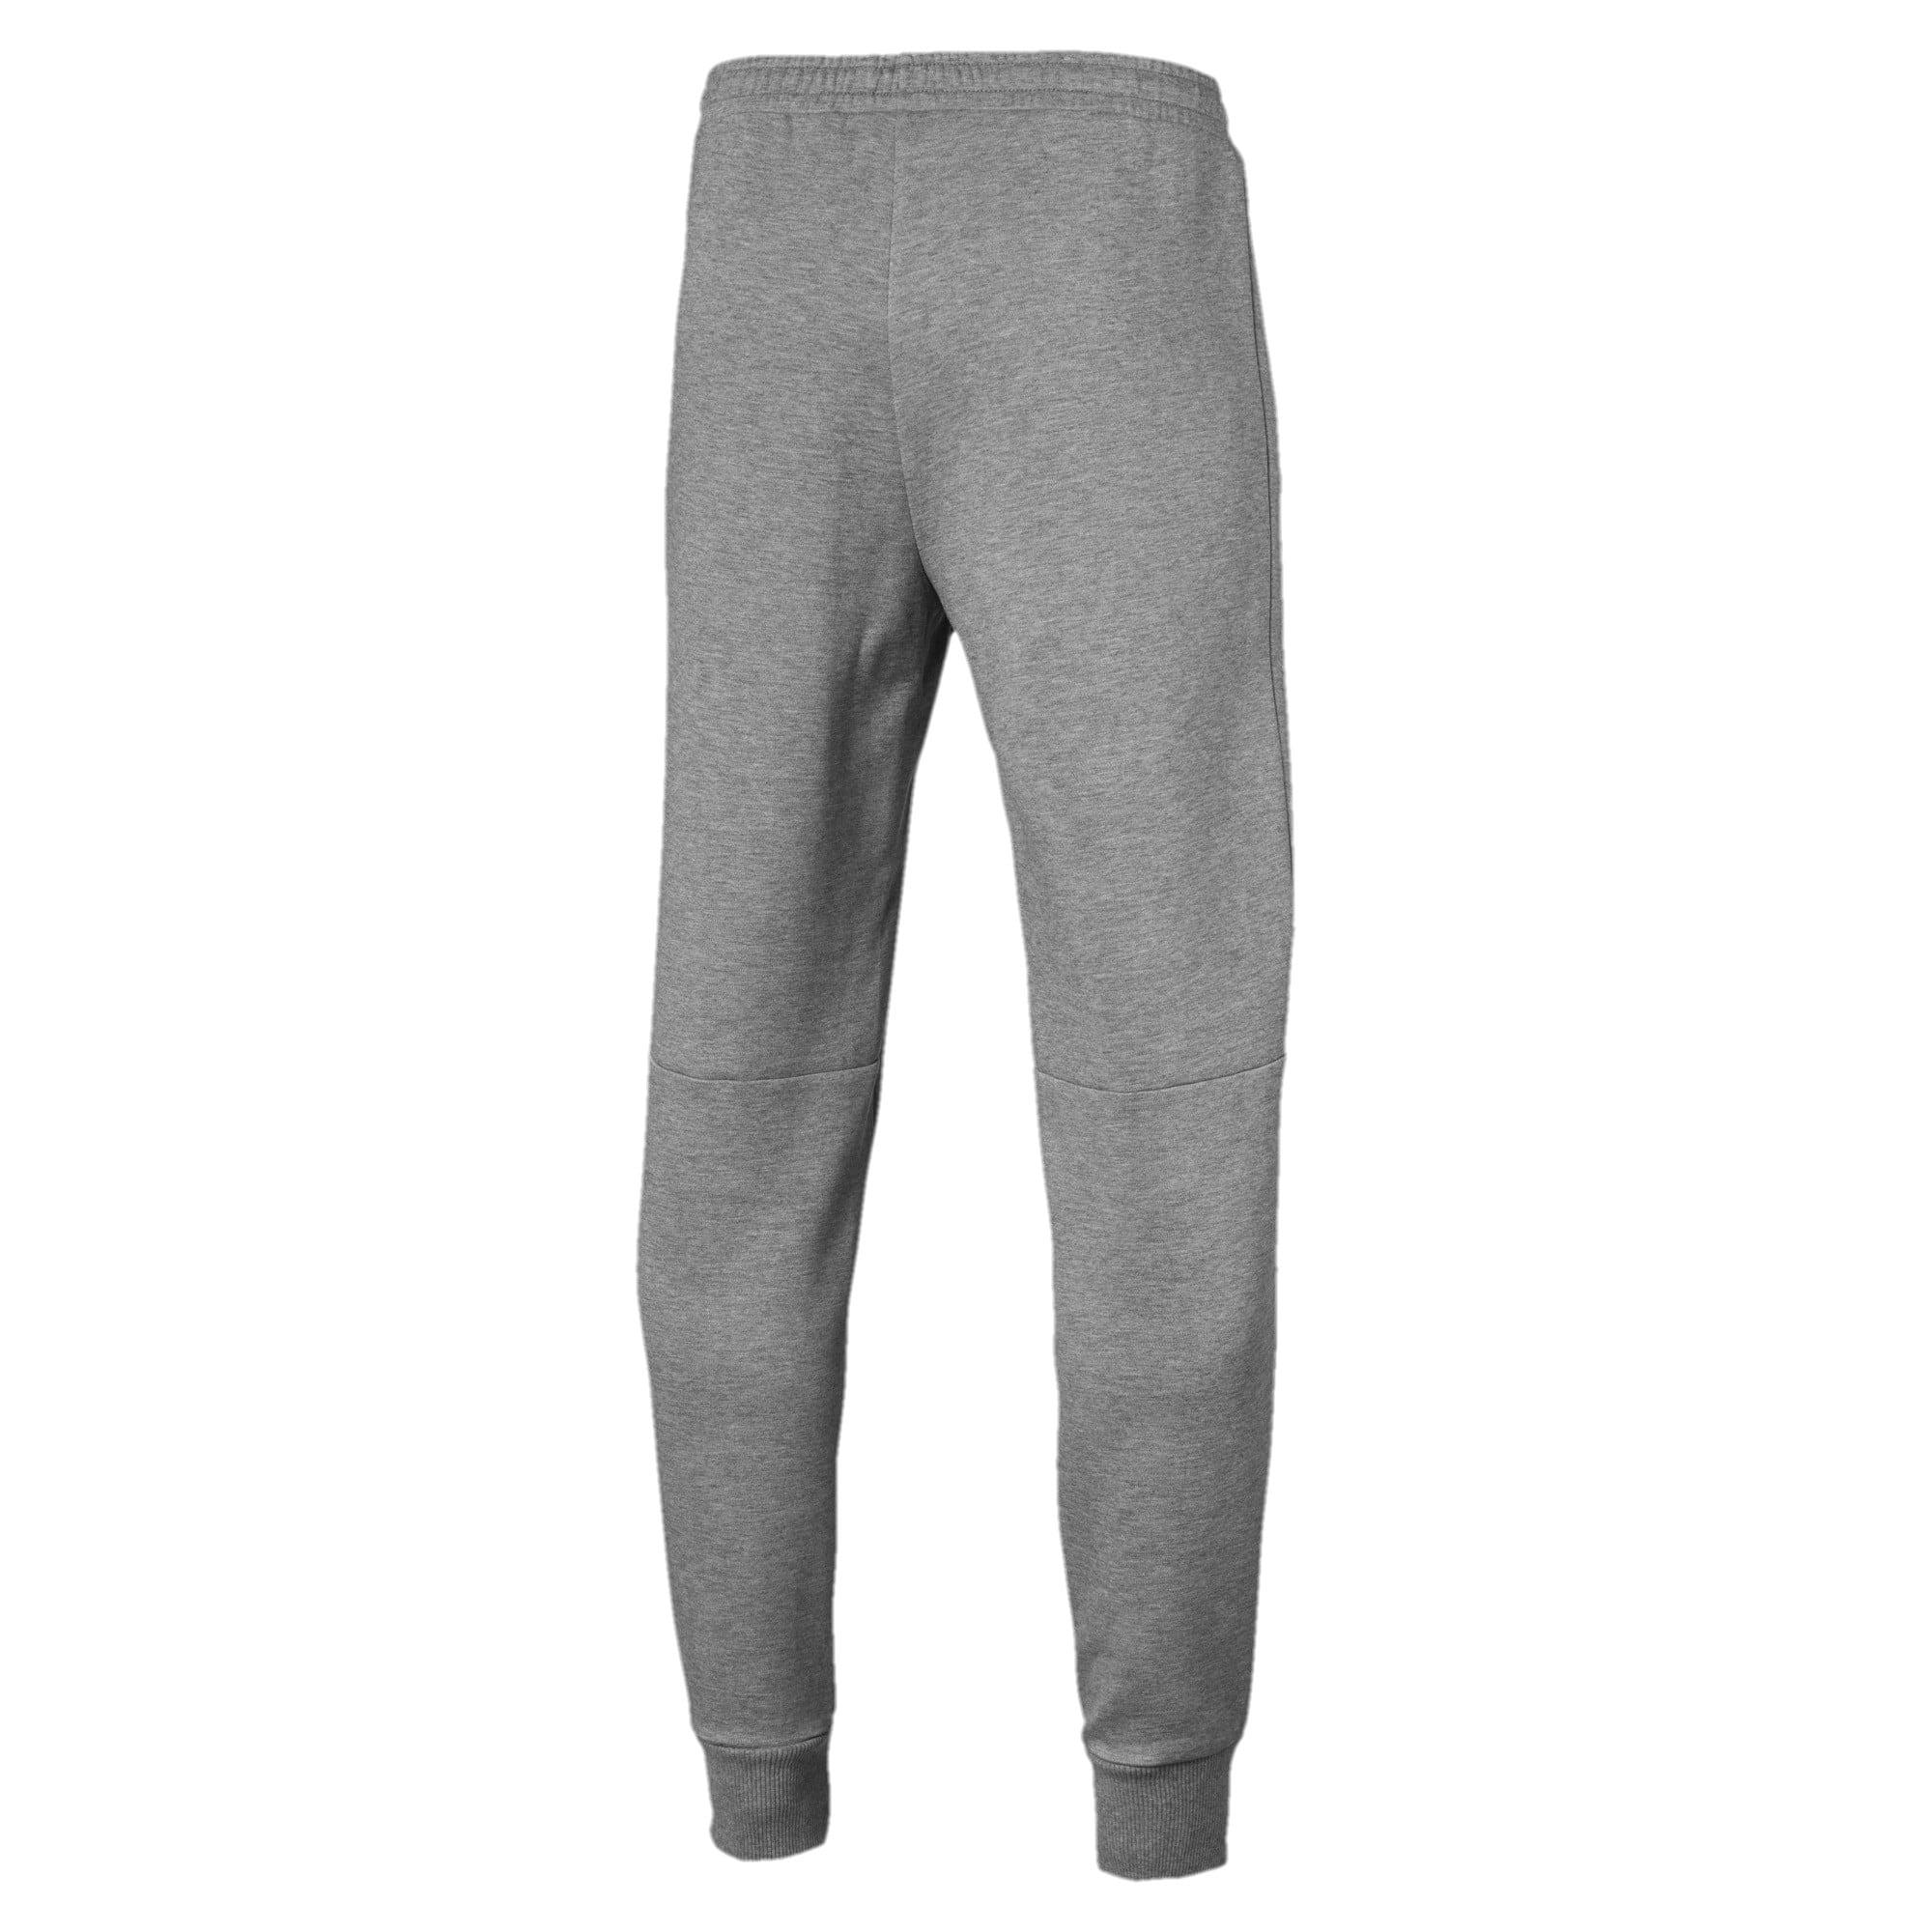 Thumbnail 4 of BMW Men's Sweatpants, Medium Gray Heather, medium